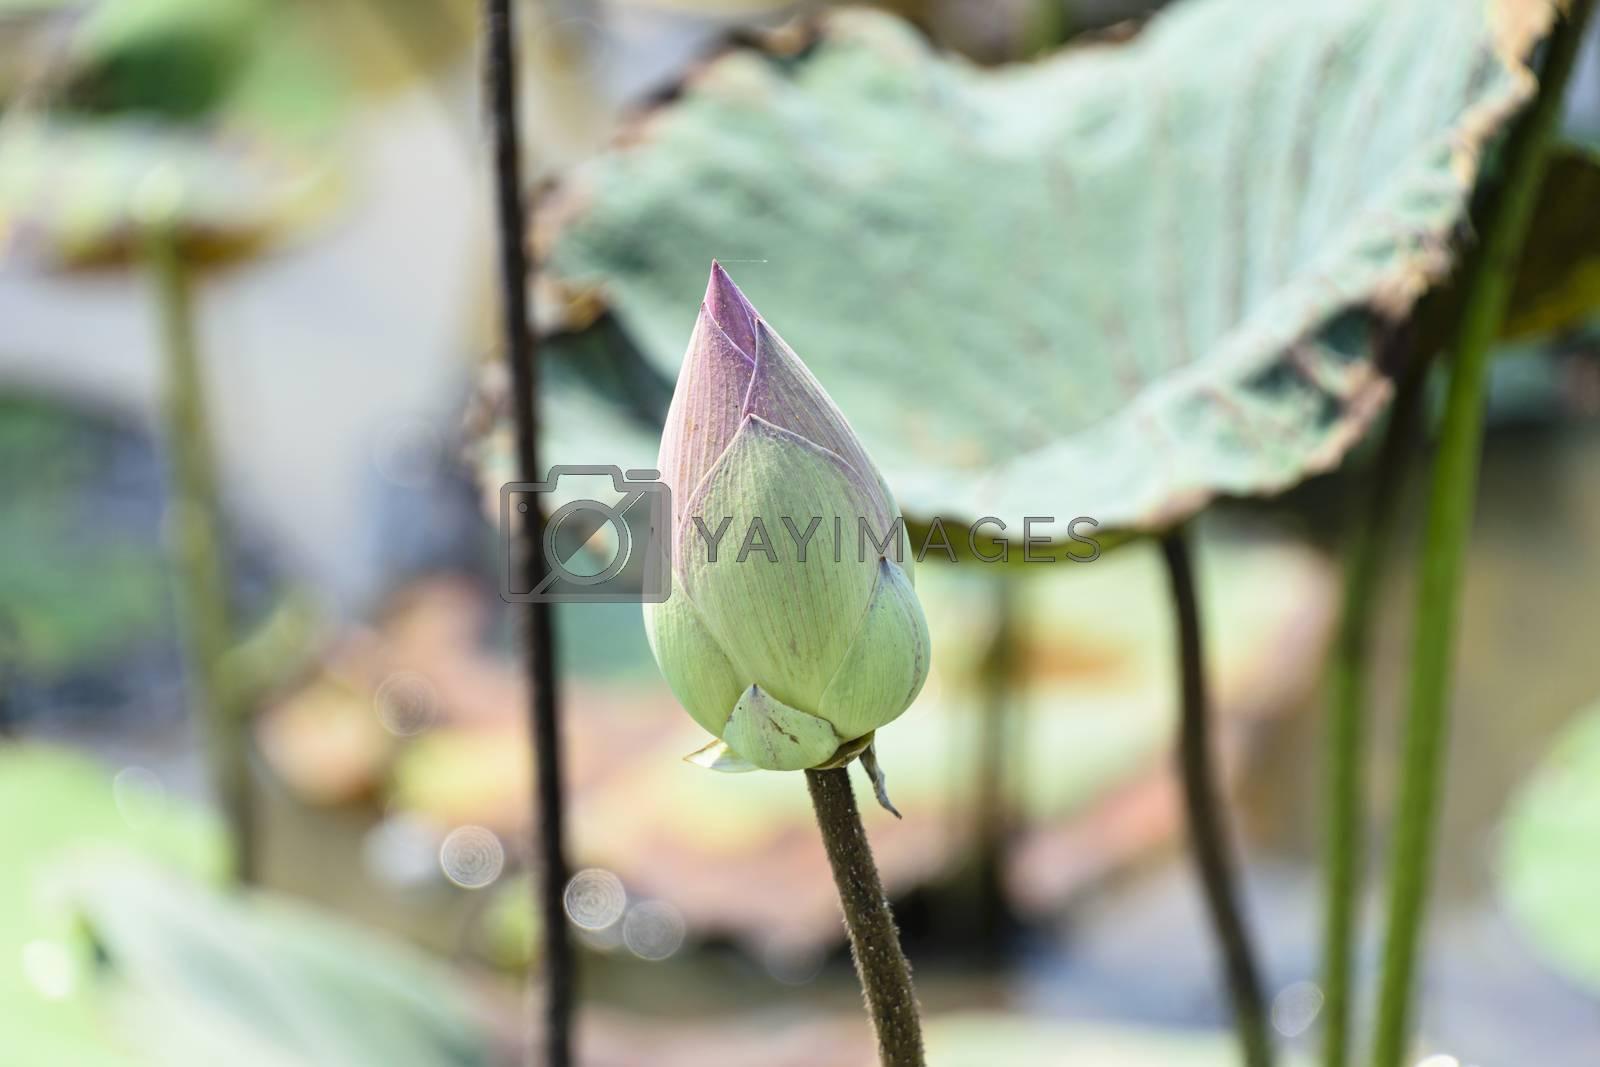 Cambodia, Tonle Sap - March 2016: Single lotus flower bud